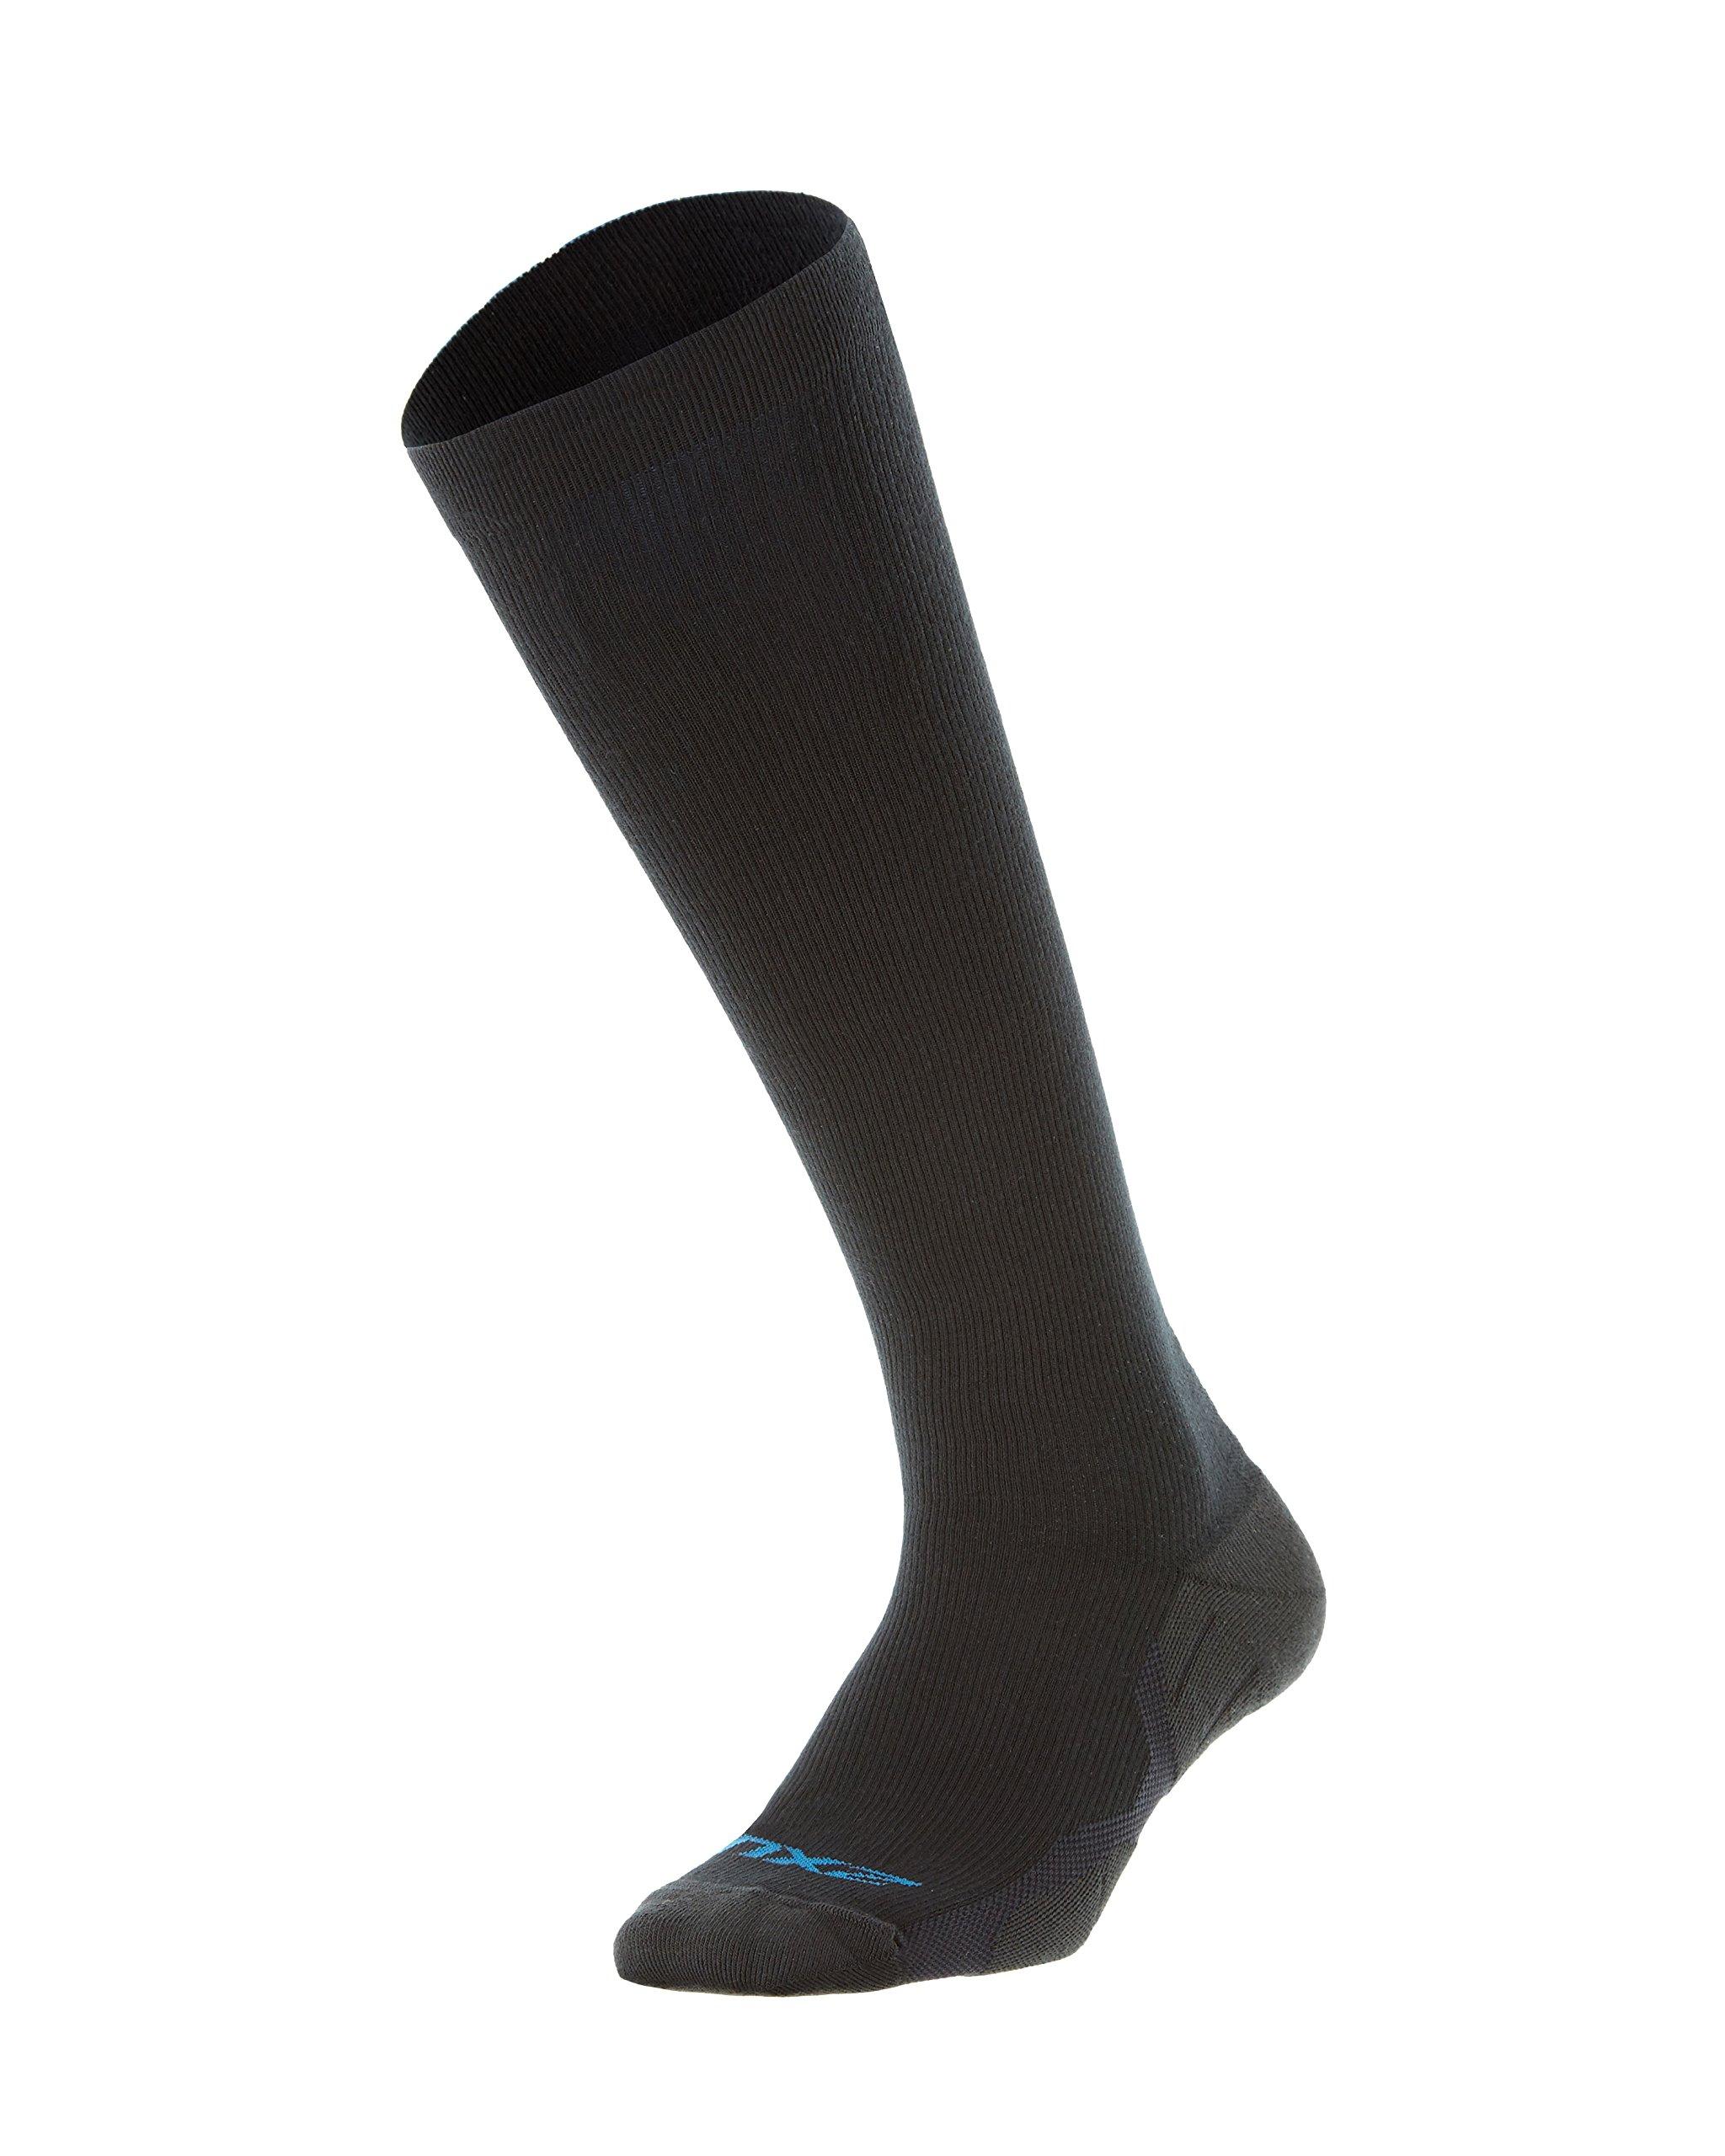 2XU Men's 24/7 Graduated Compression Socks, Black/Black, Medium